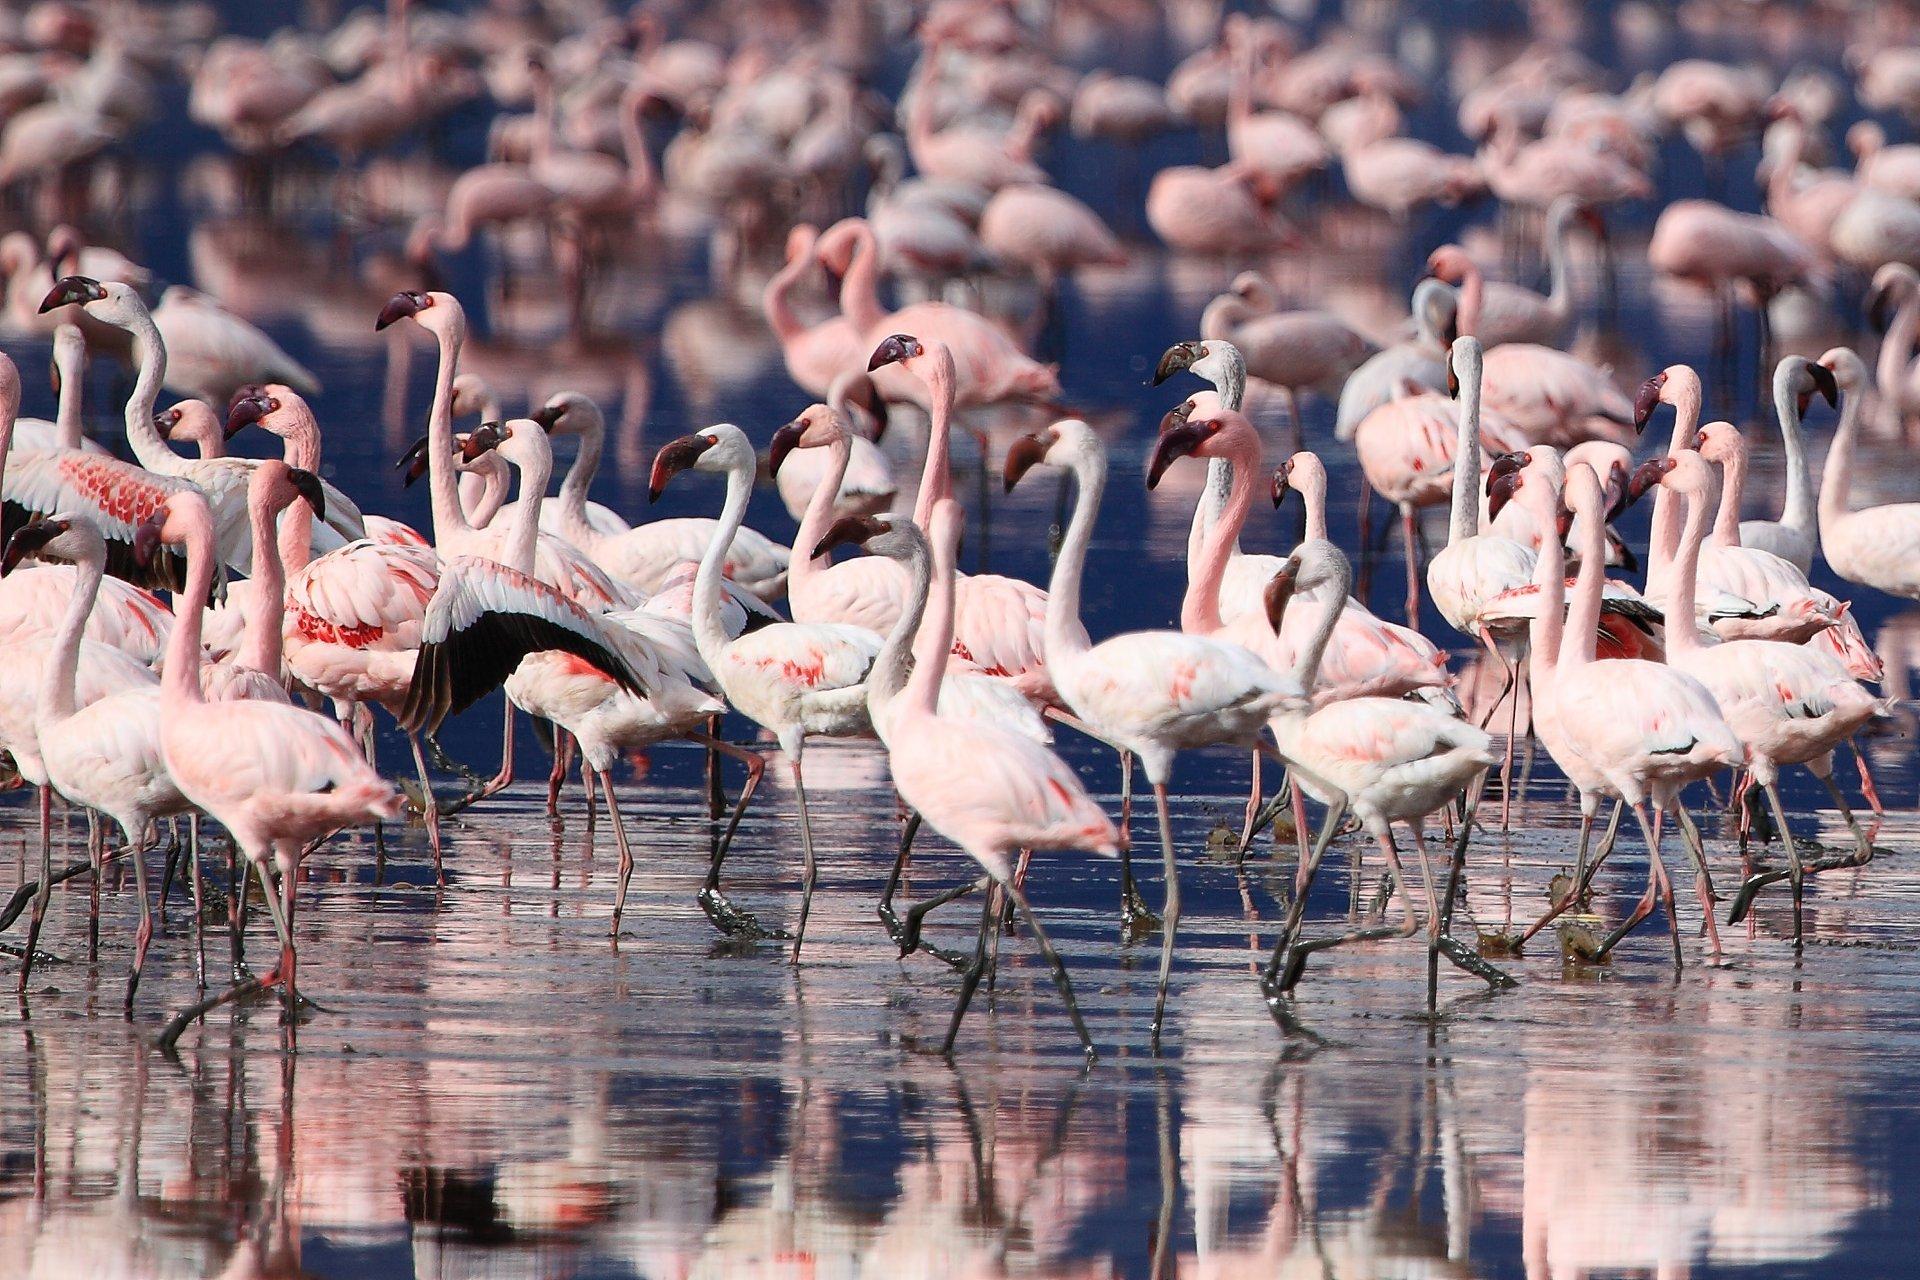 Flamingos in Tanzania 2019 - Best Time